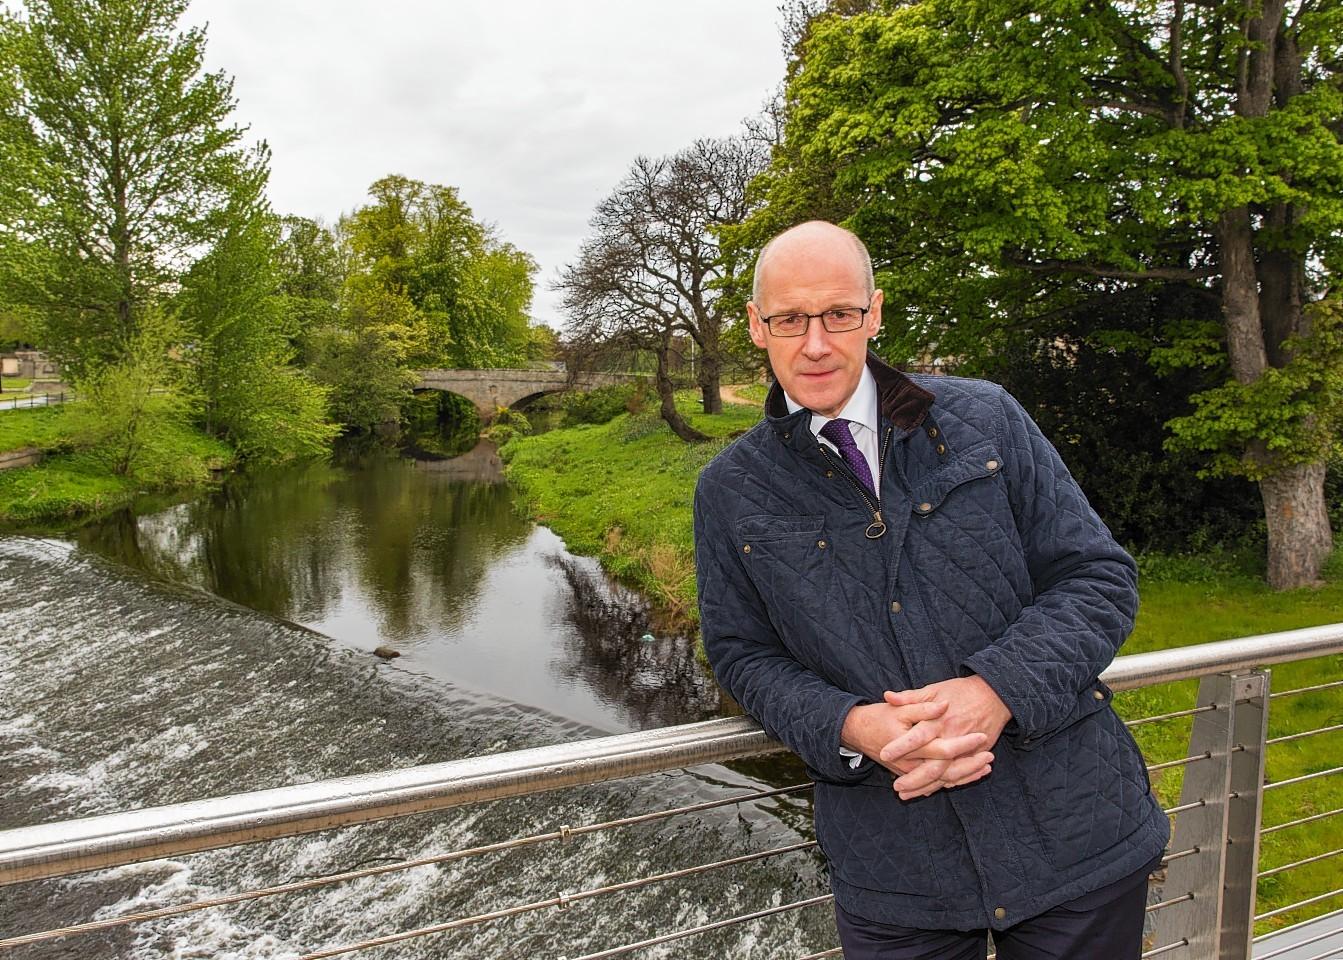 John Swinney visiting the flood scheme